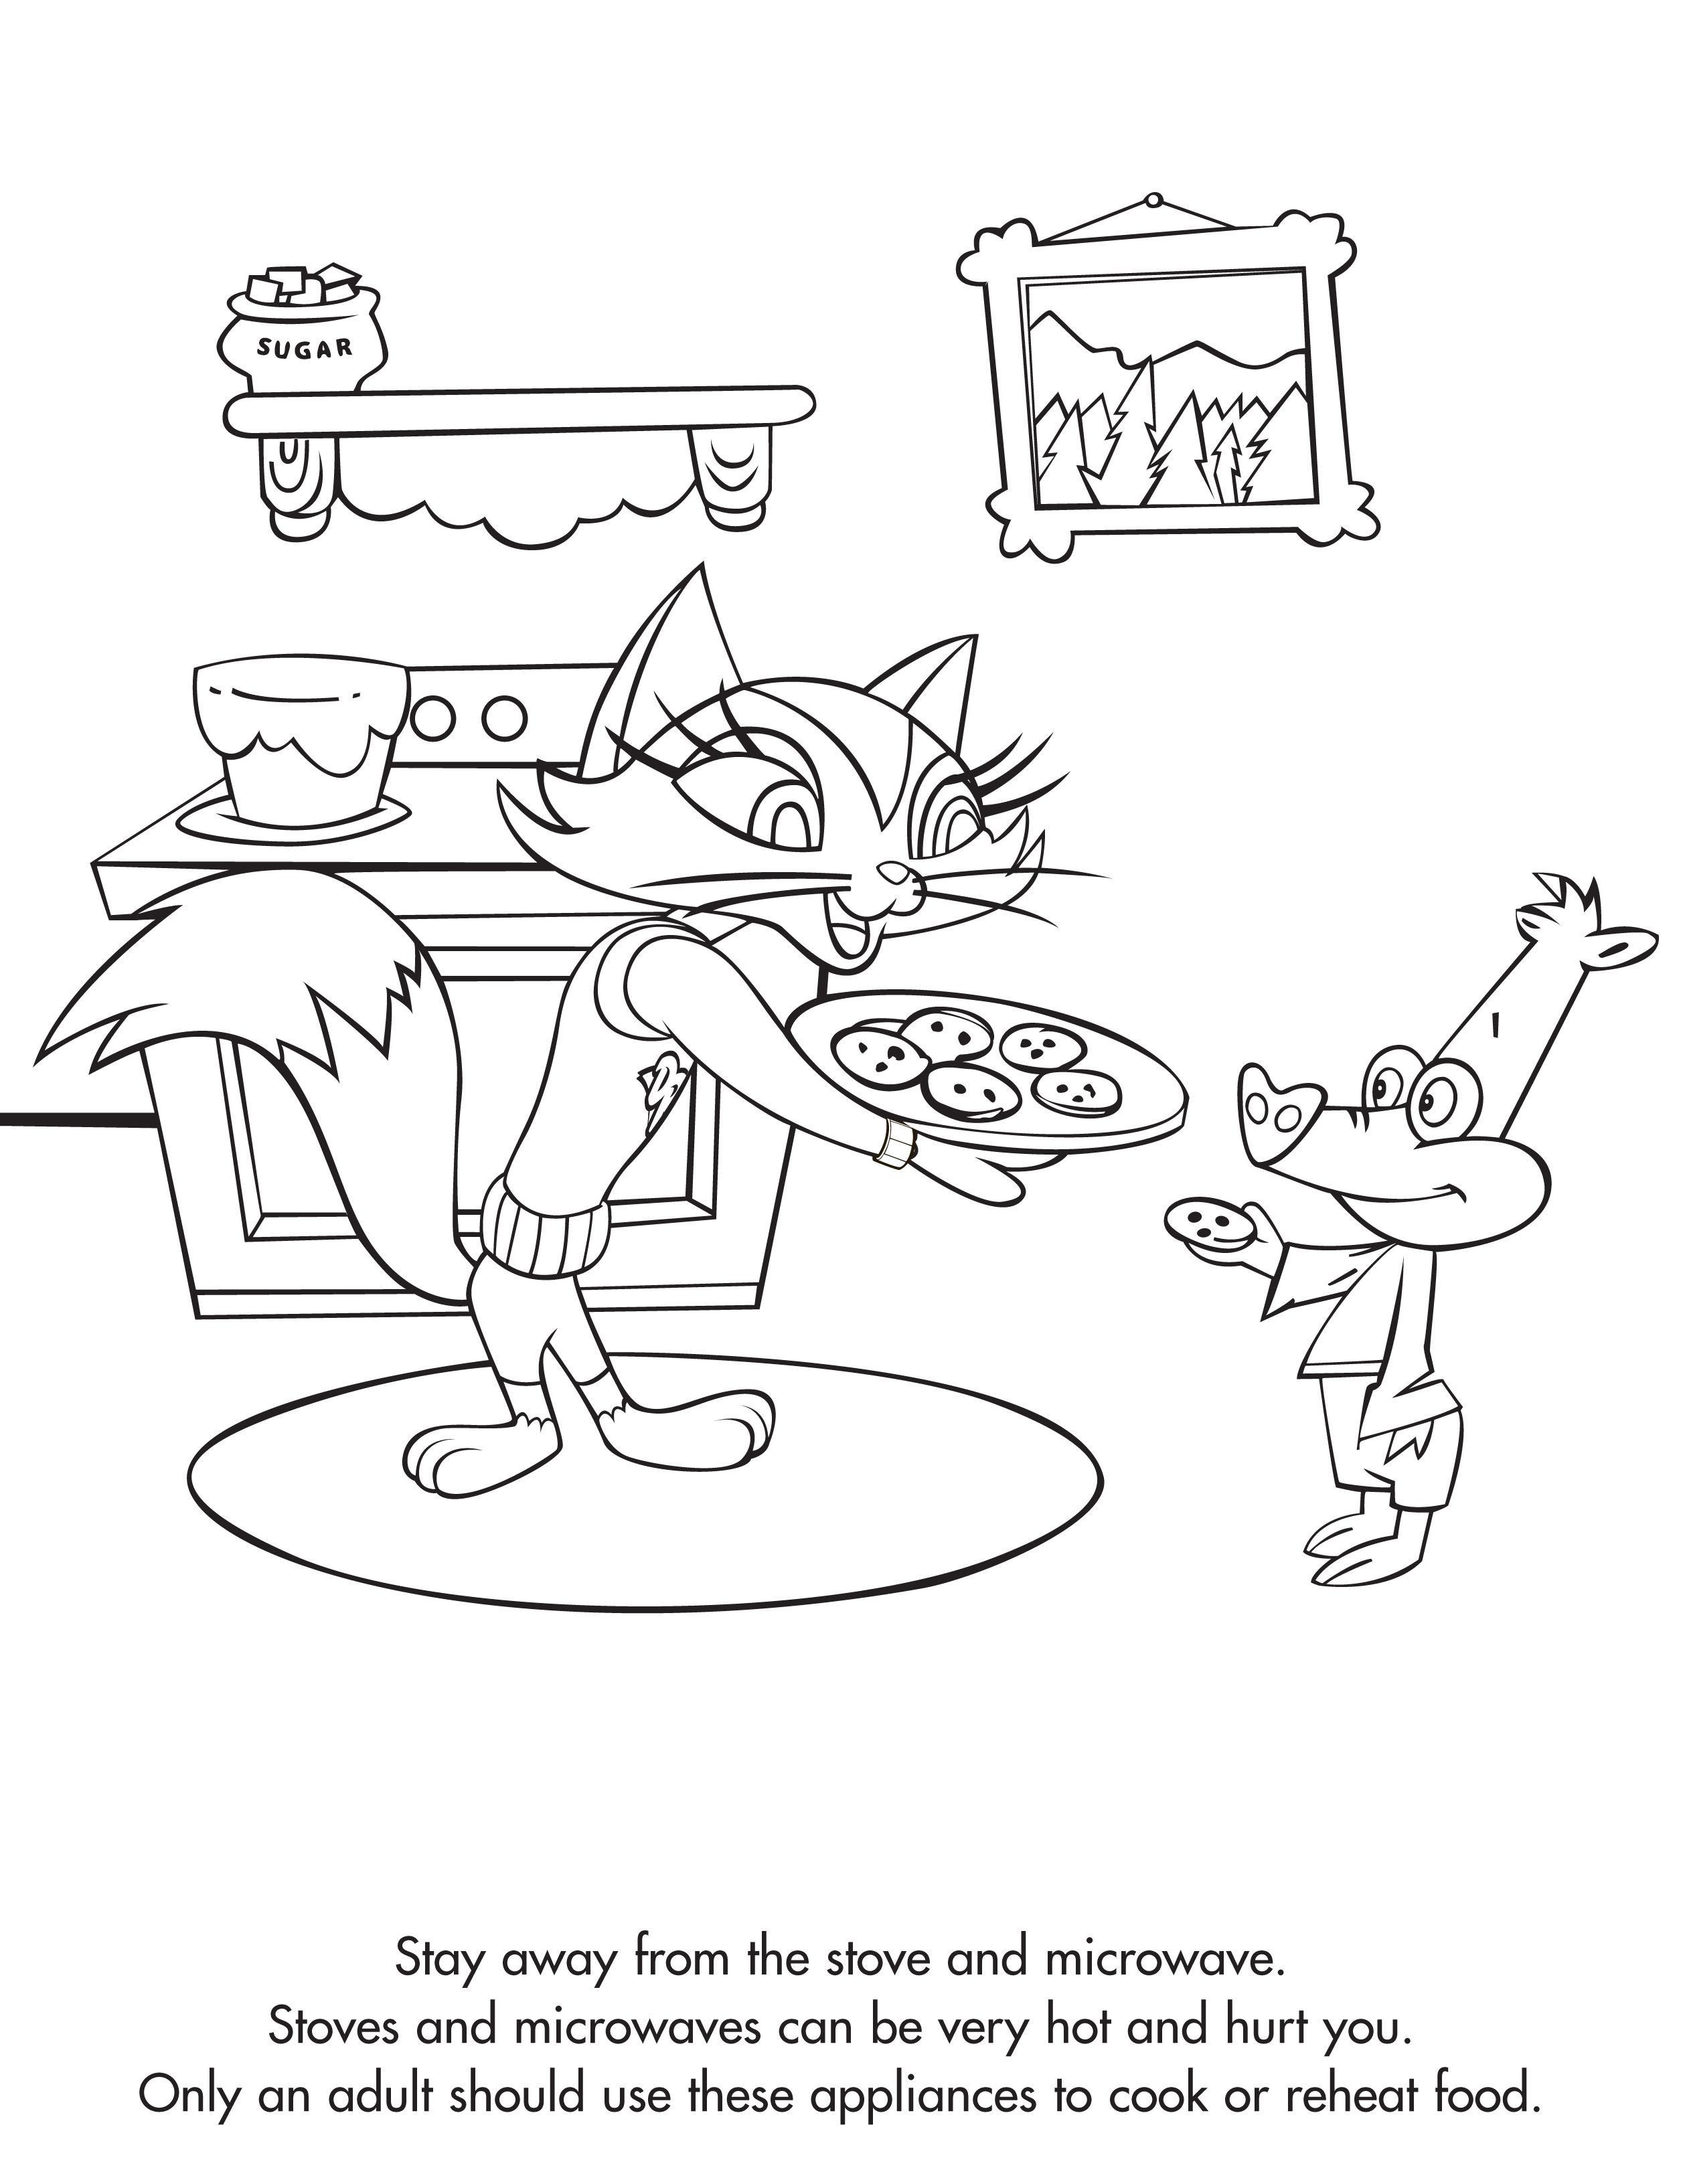 Teach Your Children Kitchen Safety When They Want To Help